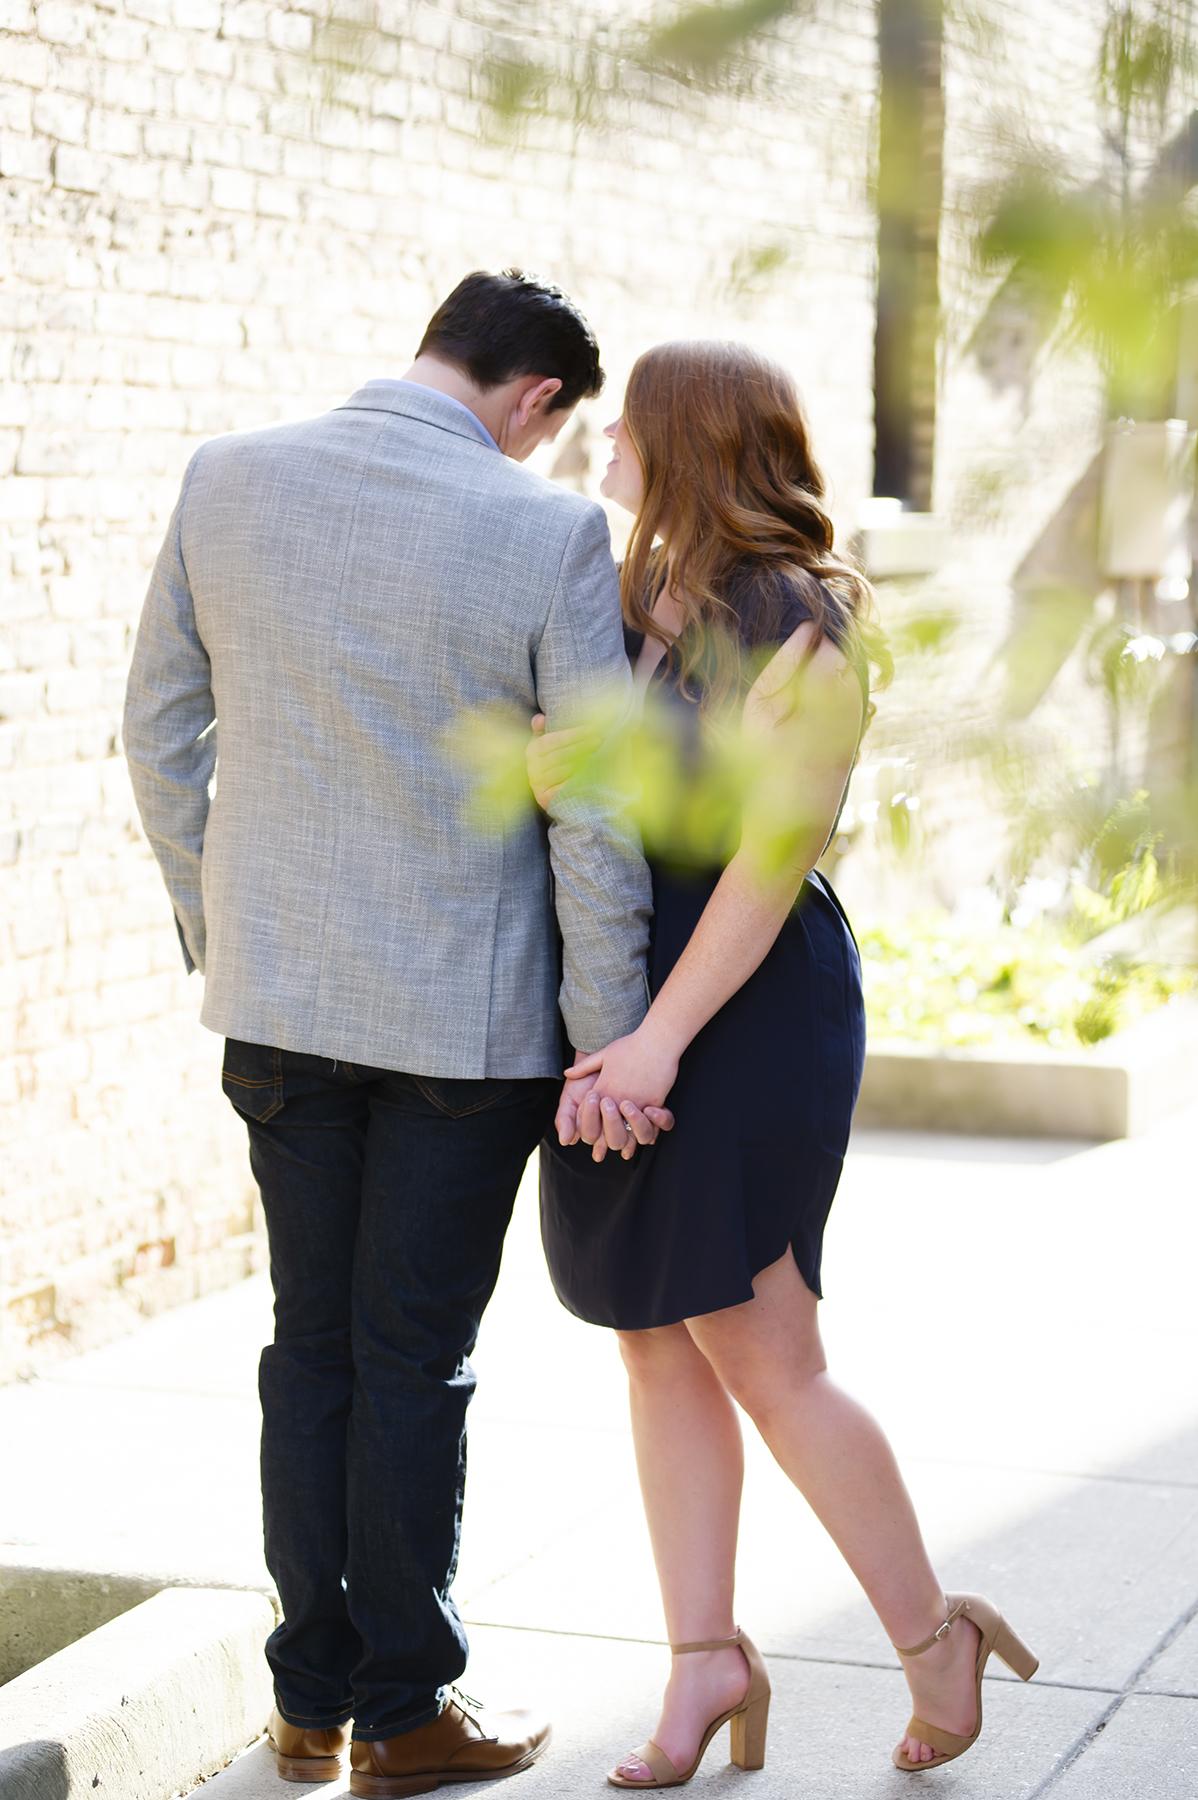 Dory_Engaged_libertyville_love_photographer_wedding_03 copy.jpg